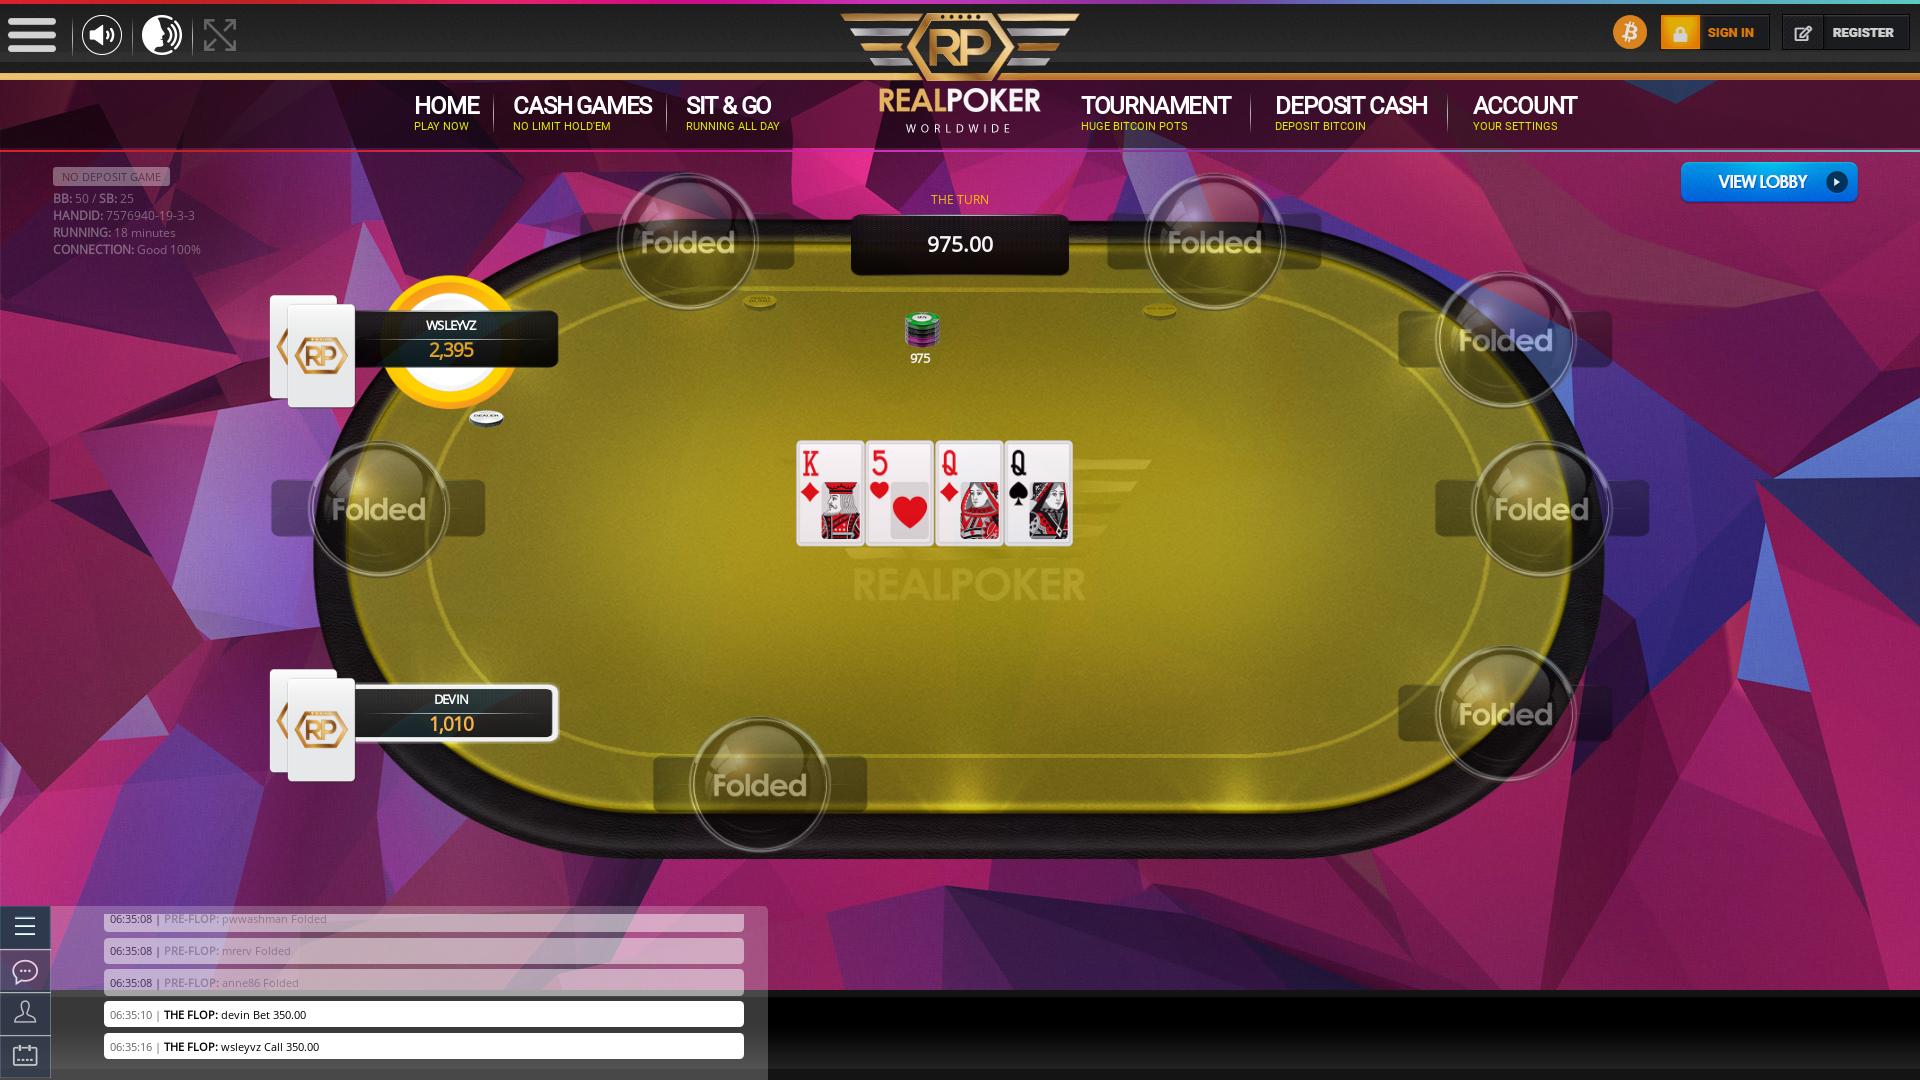 Casino bitcoin - 59164